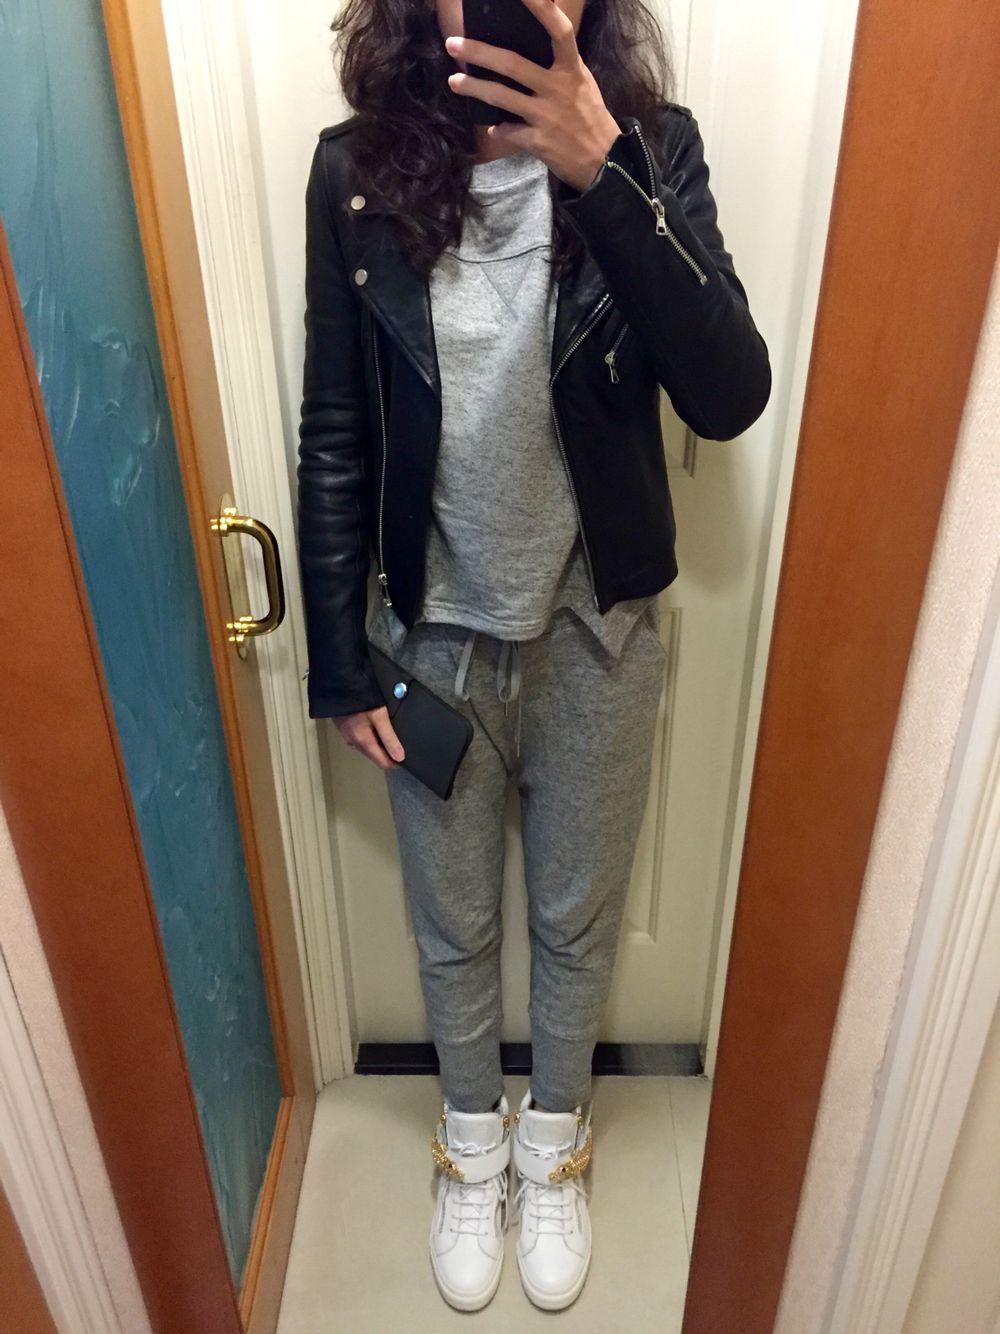 UNIQLO x Helmut Lang sweatshirt and pants, H&M leather